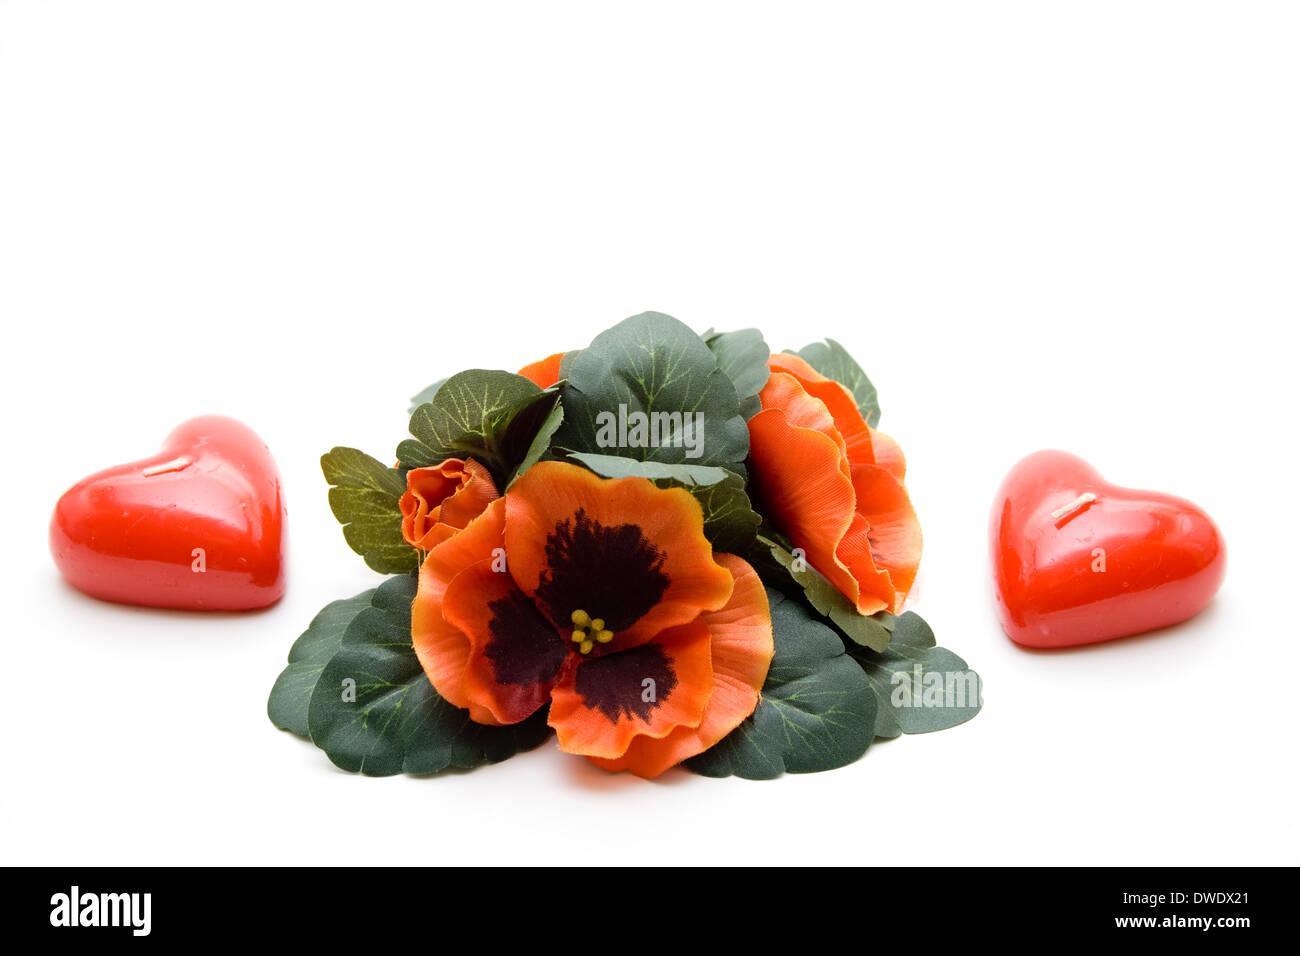 heart candle stockfotos heart candle bilder alamy. Black Bedroom Furniture Sets. Home Design Ideas